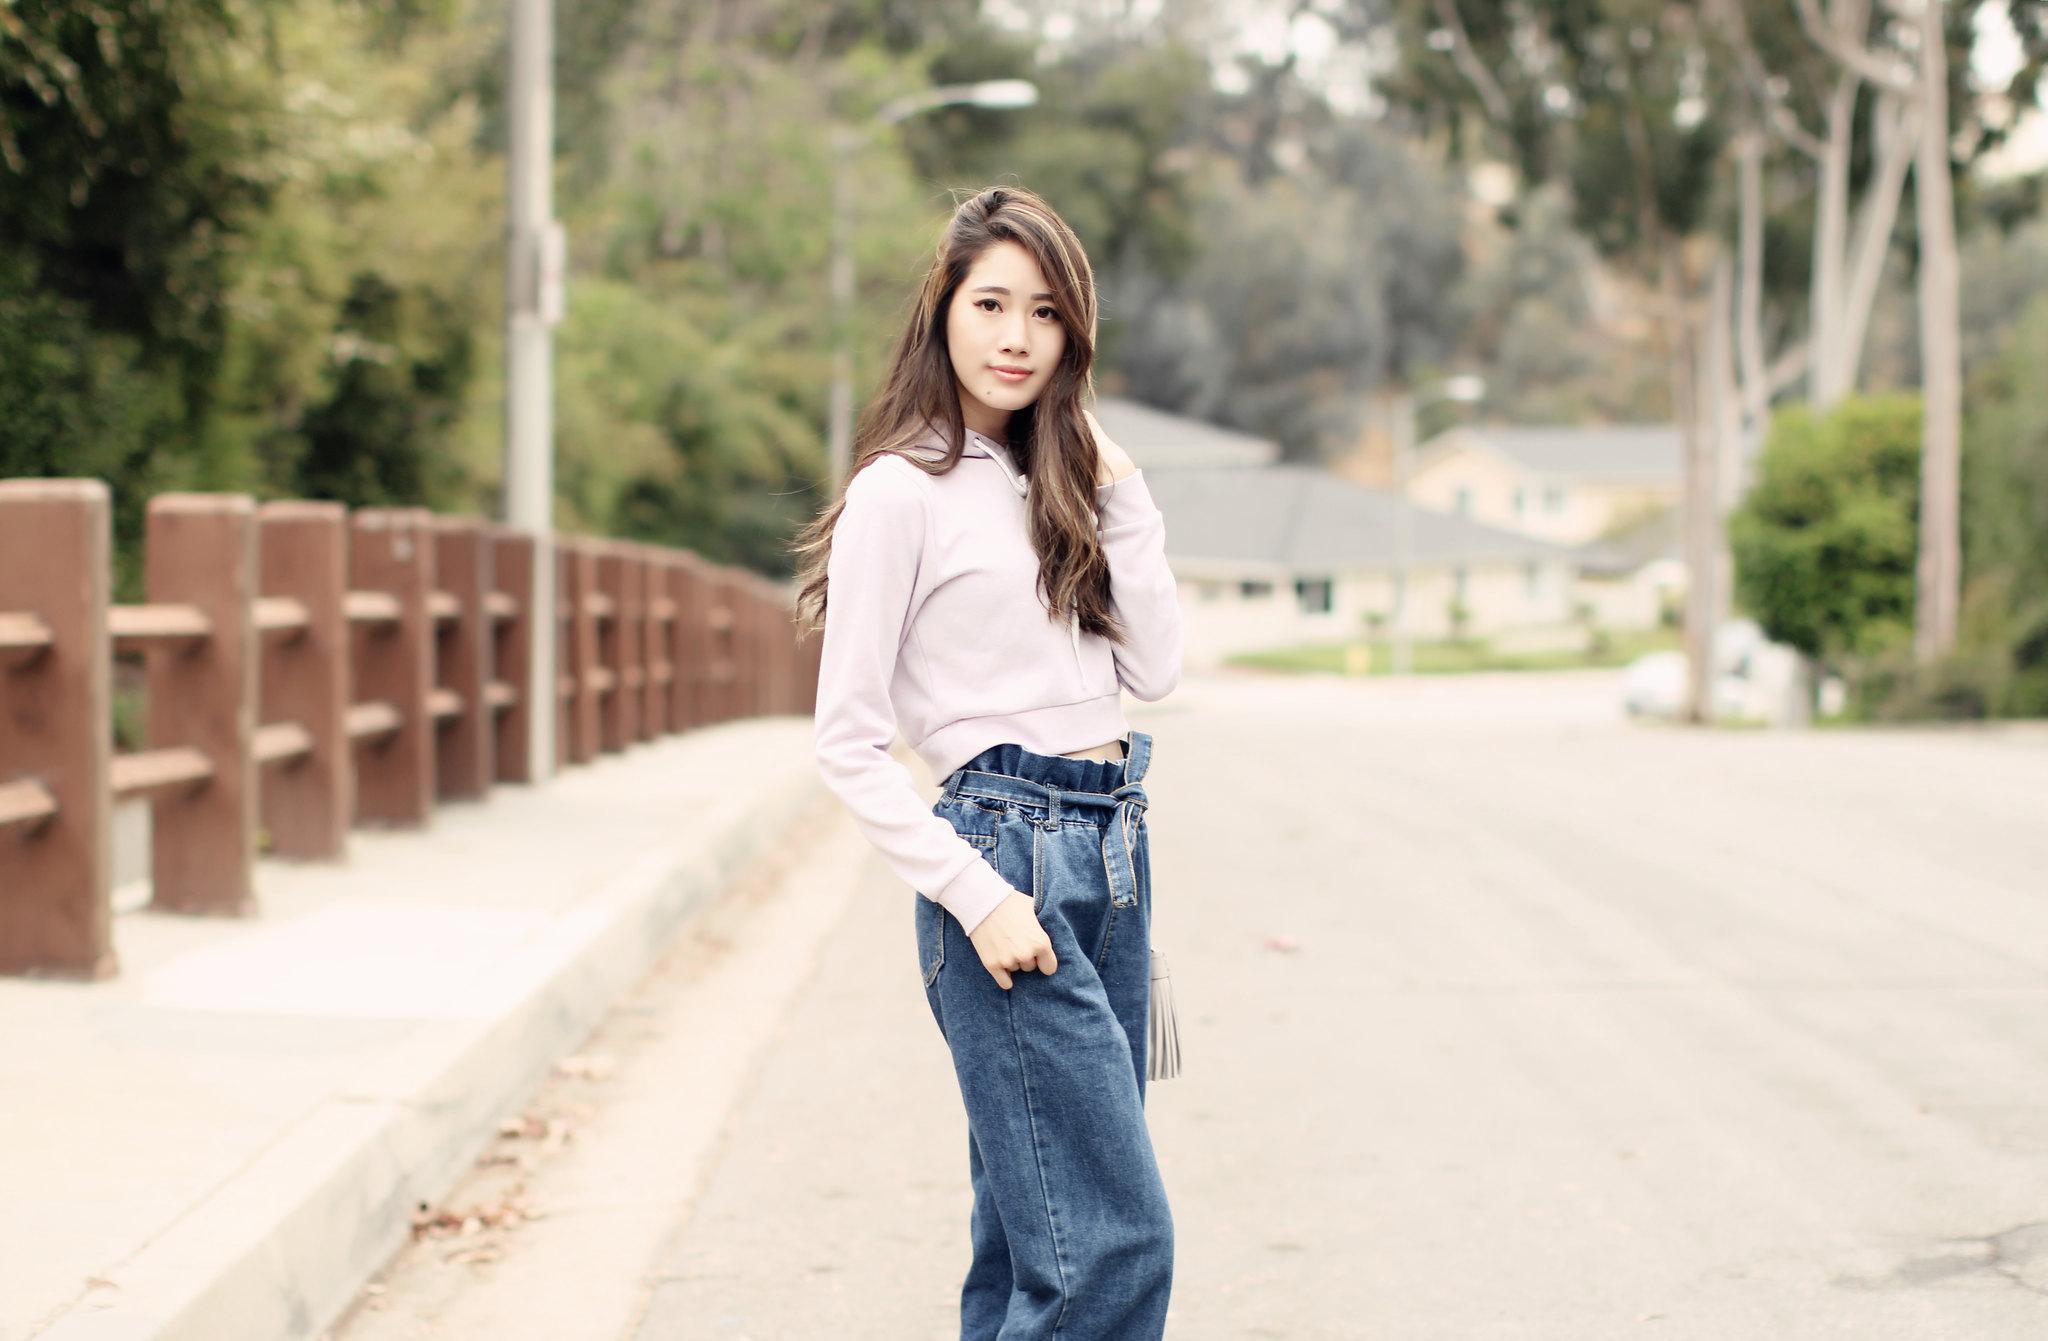 5058-ootd-fashion-style-outfitoftheday-wiwt-streetstyle-zara-f21xme-denim-thrifted-guess-koreanfashion-lookbook-elizabeeetht-clothestoyouuu